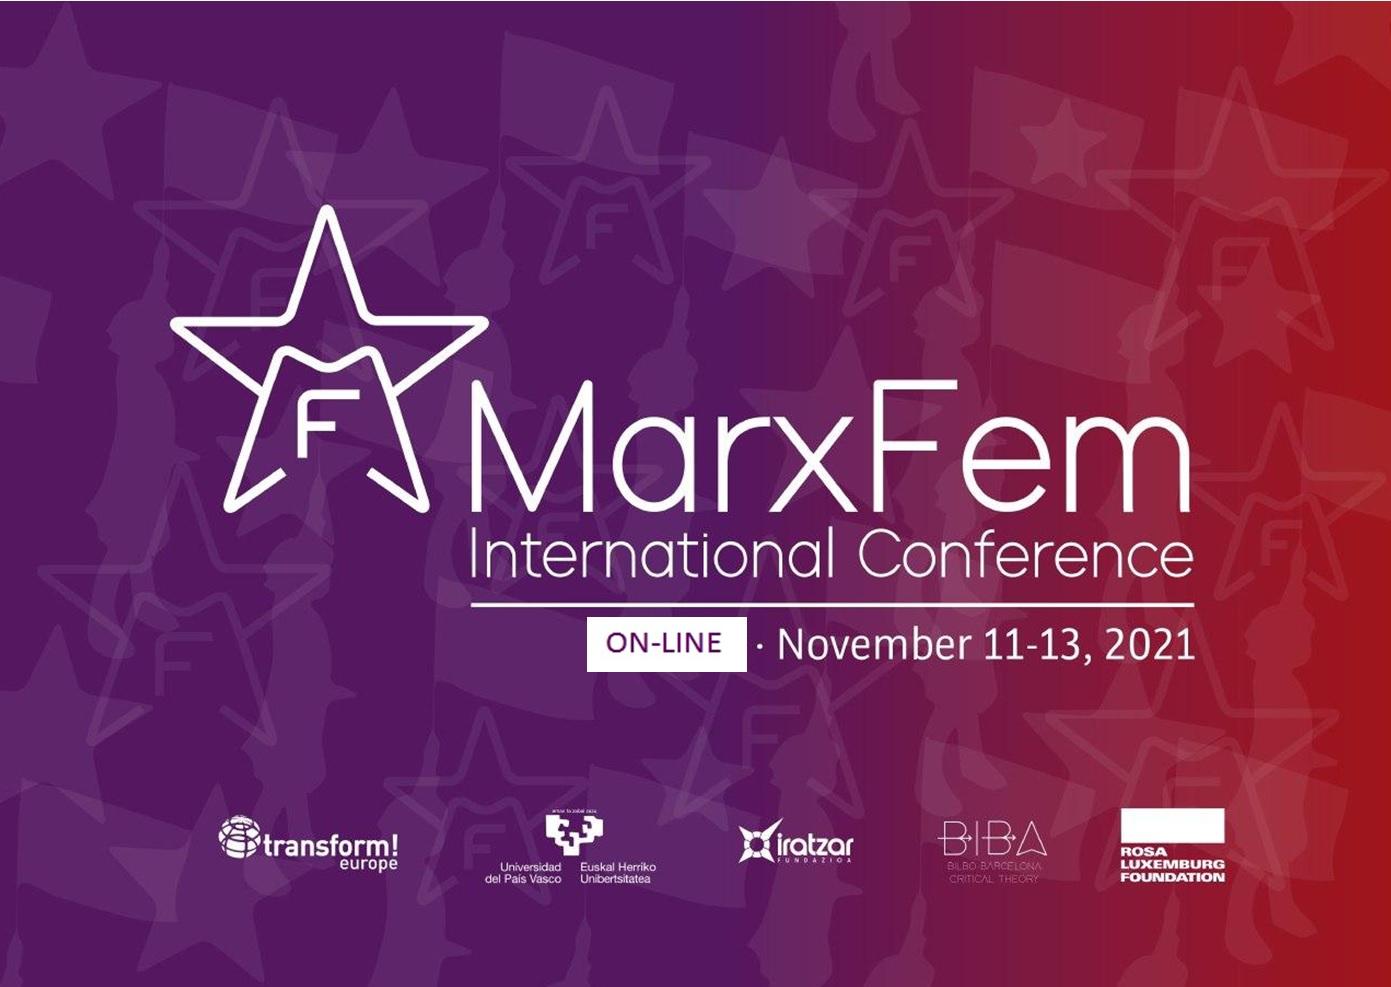 International Marxist Feminist Conference